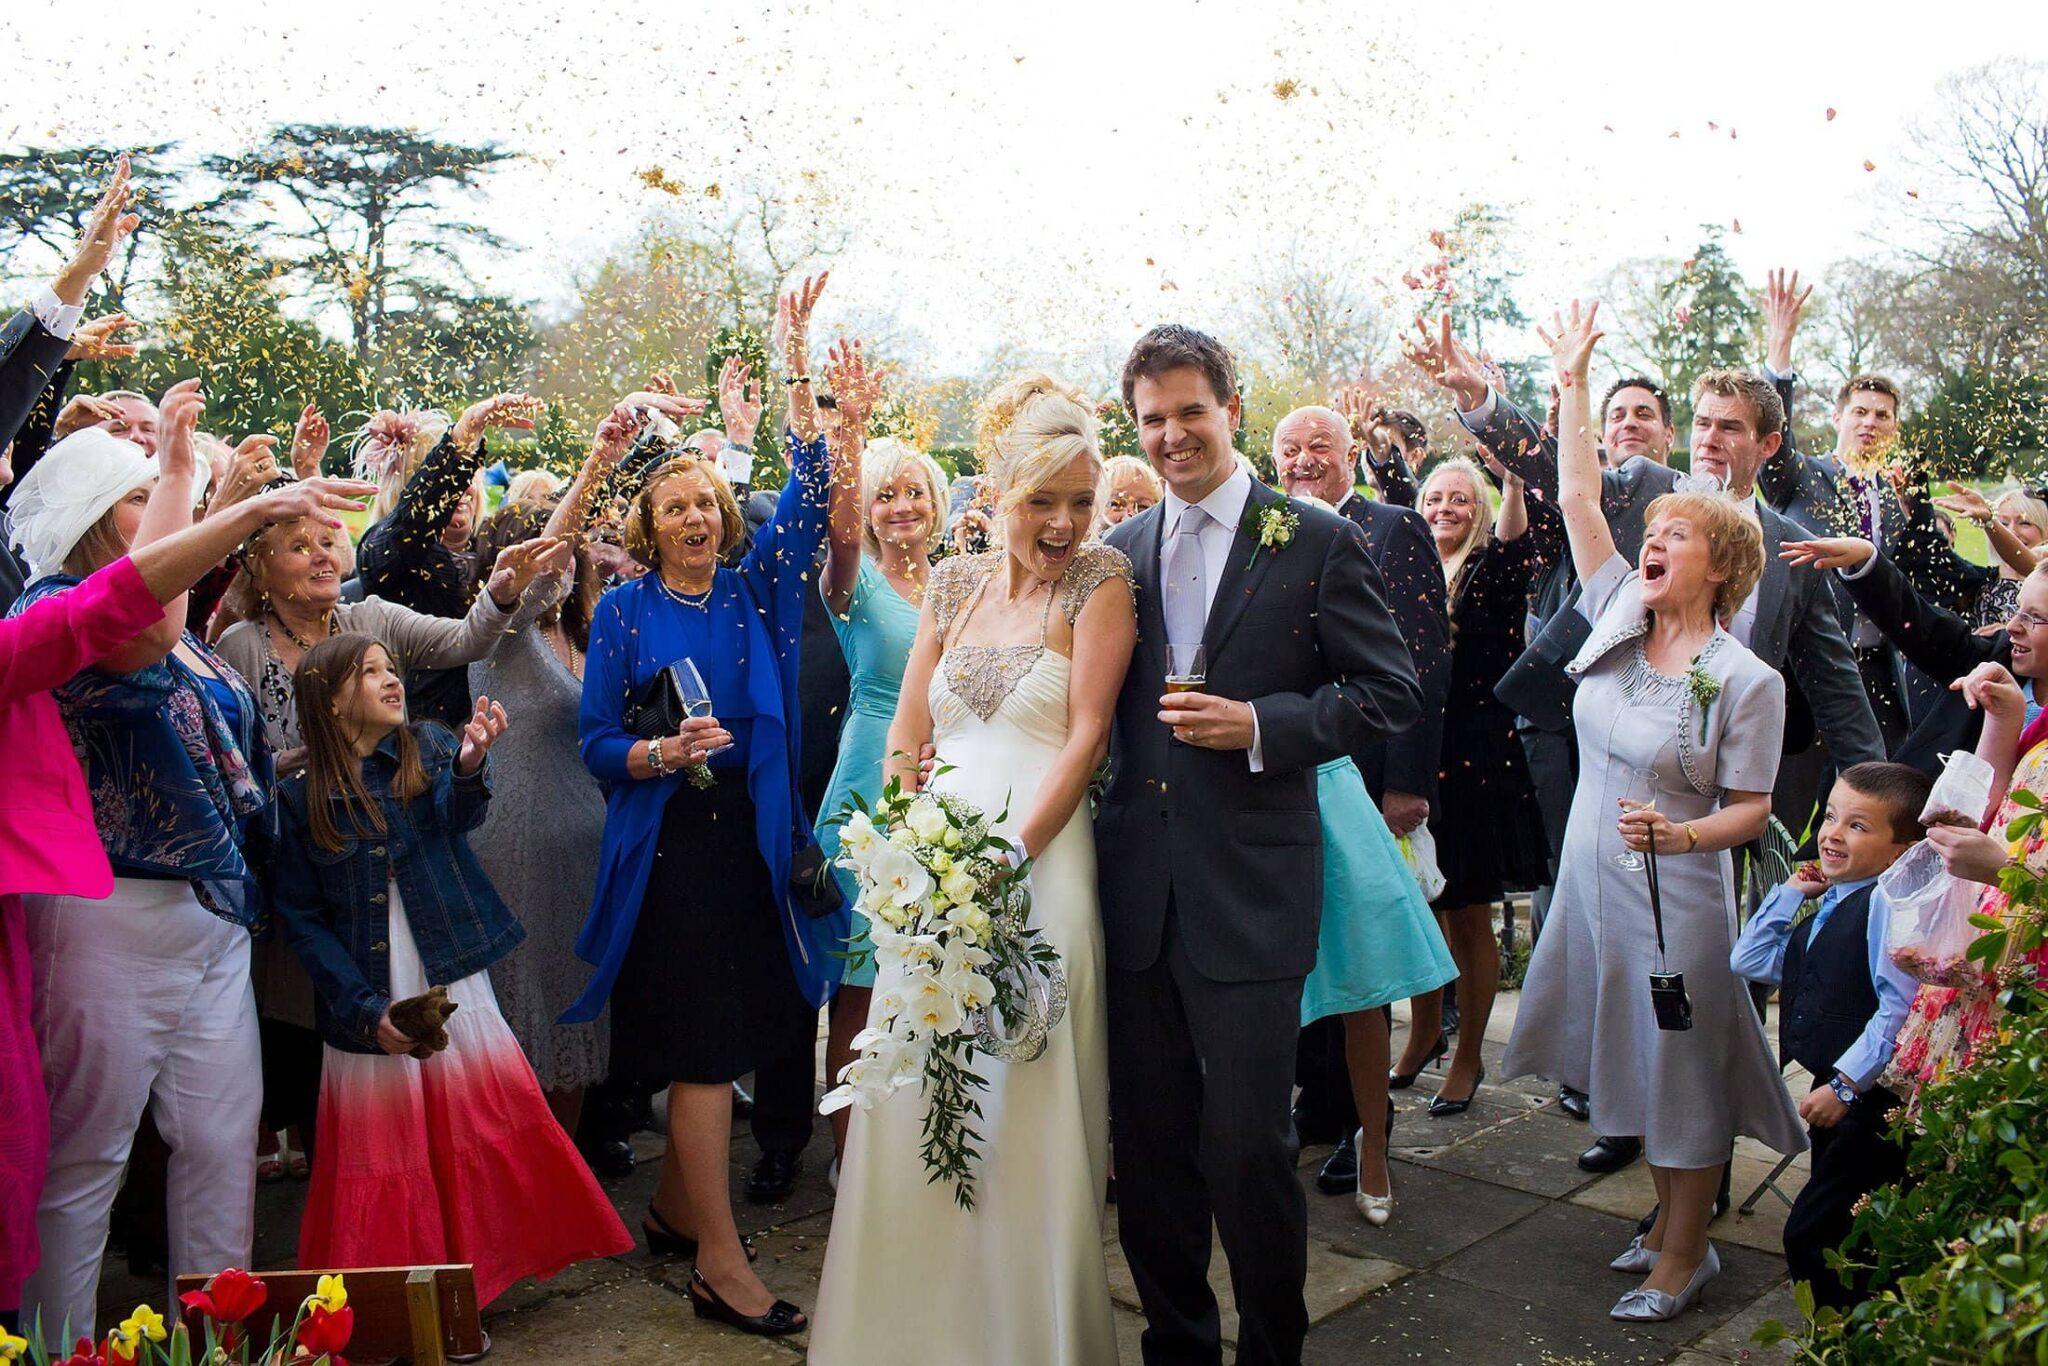 Hengrave Hall wedding photographer | Hannah & James